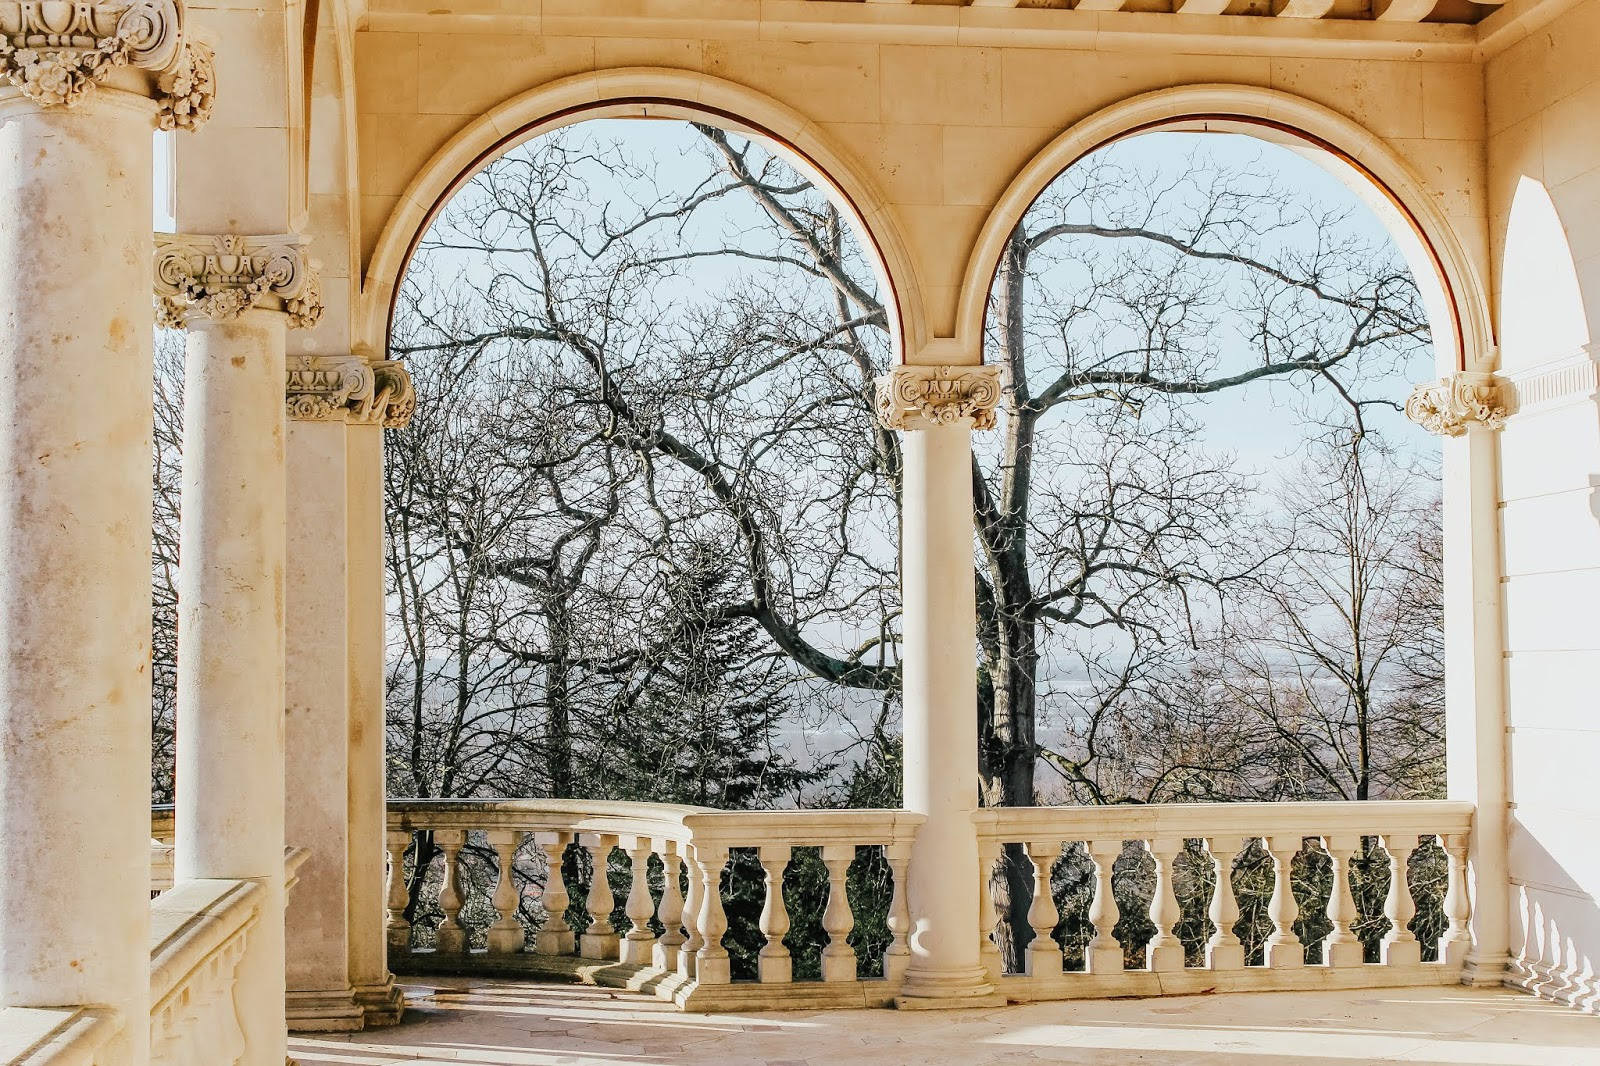 cliveden balcony blogger photoshoot